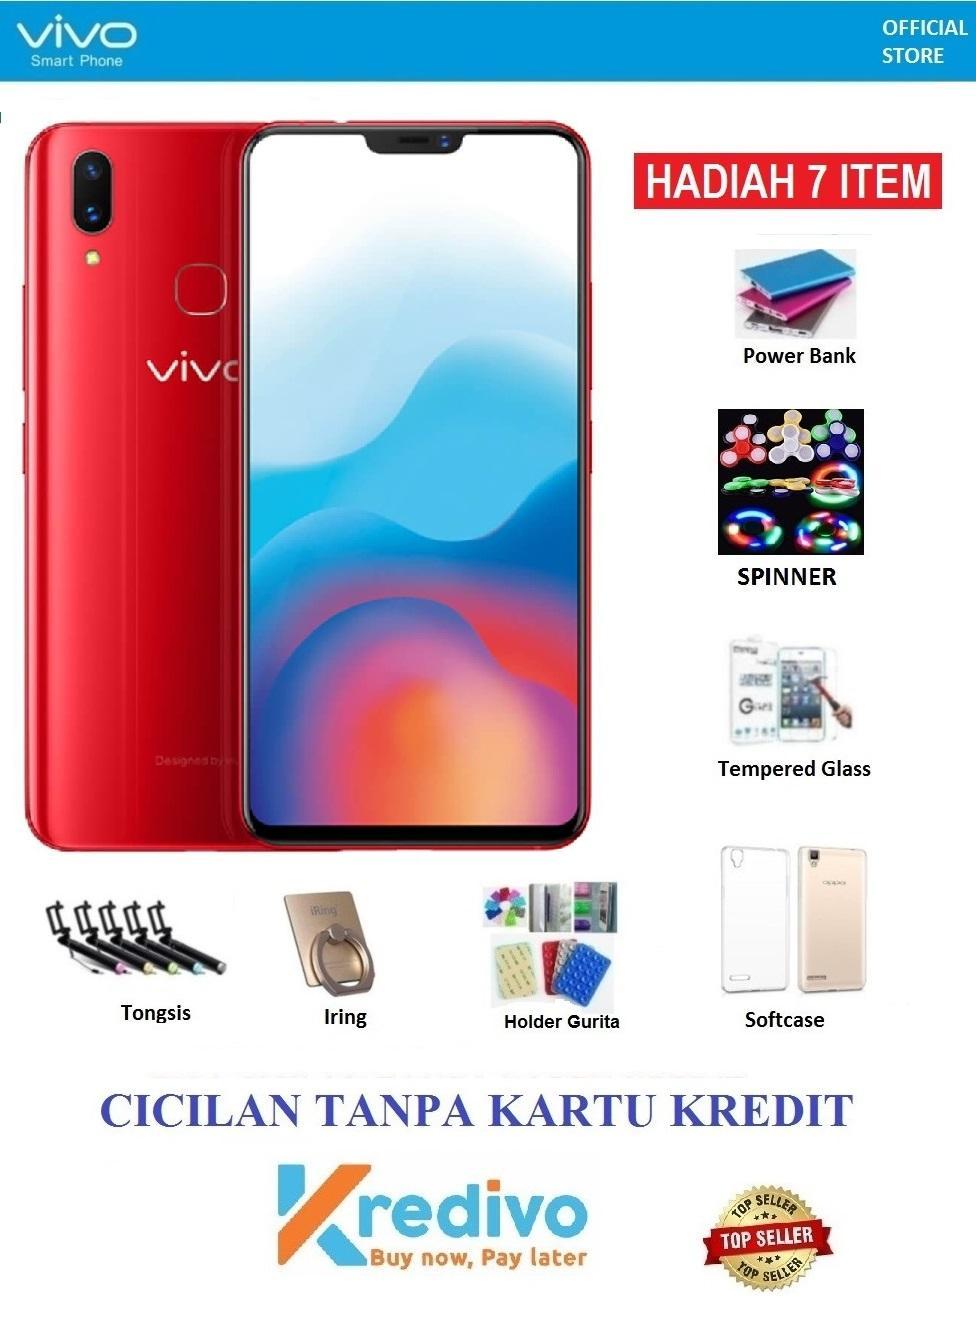 Vivo V9 Ram 6GB/64GB - Bisa Cicilan Tanpa Kartu Kredit + Hadiah 7 Acc